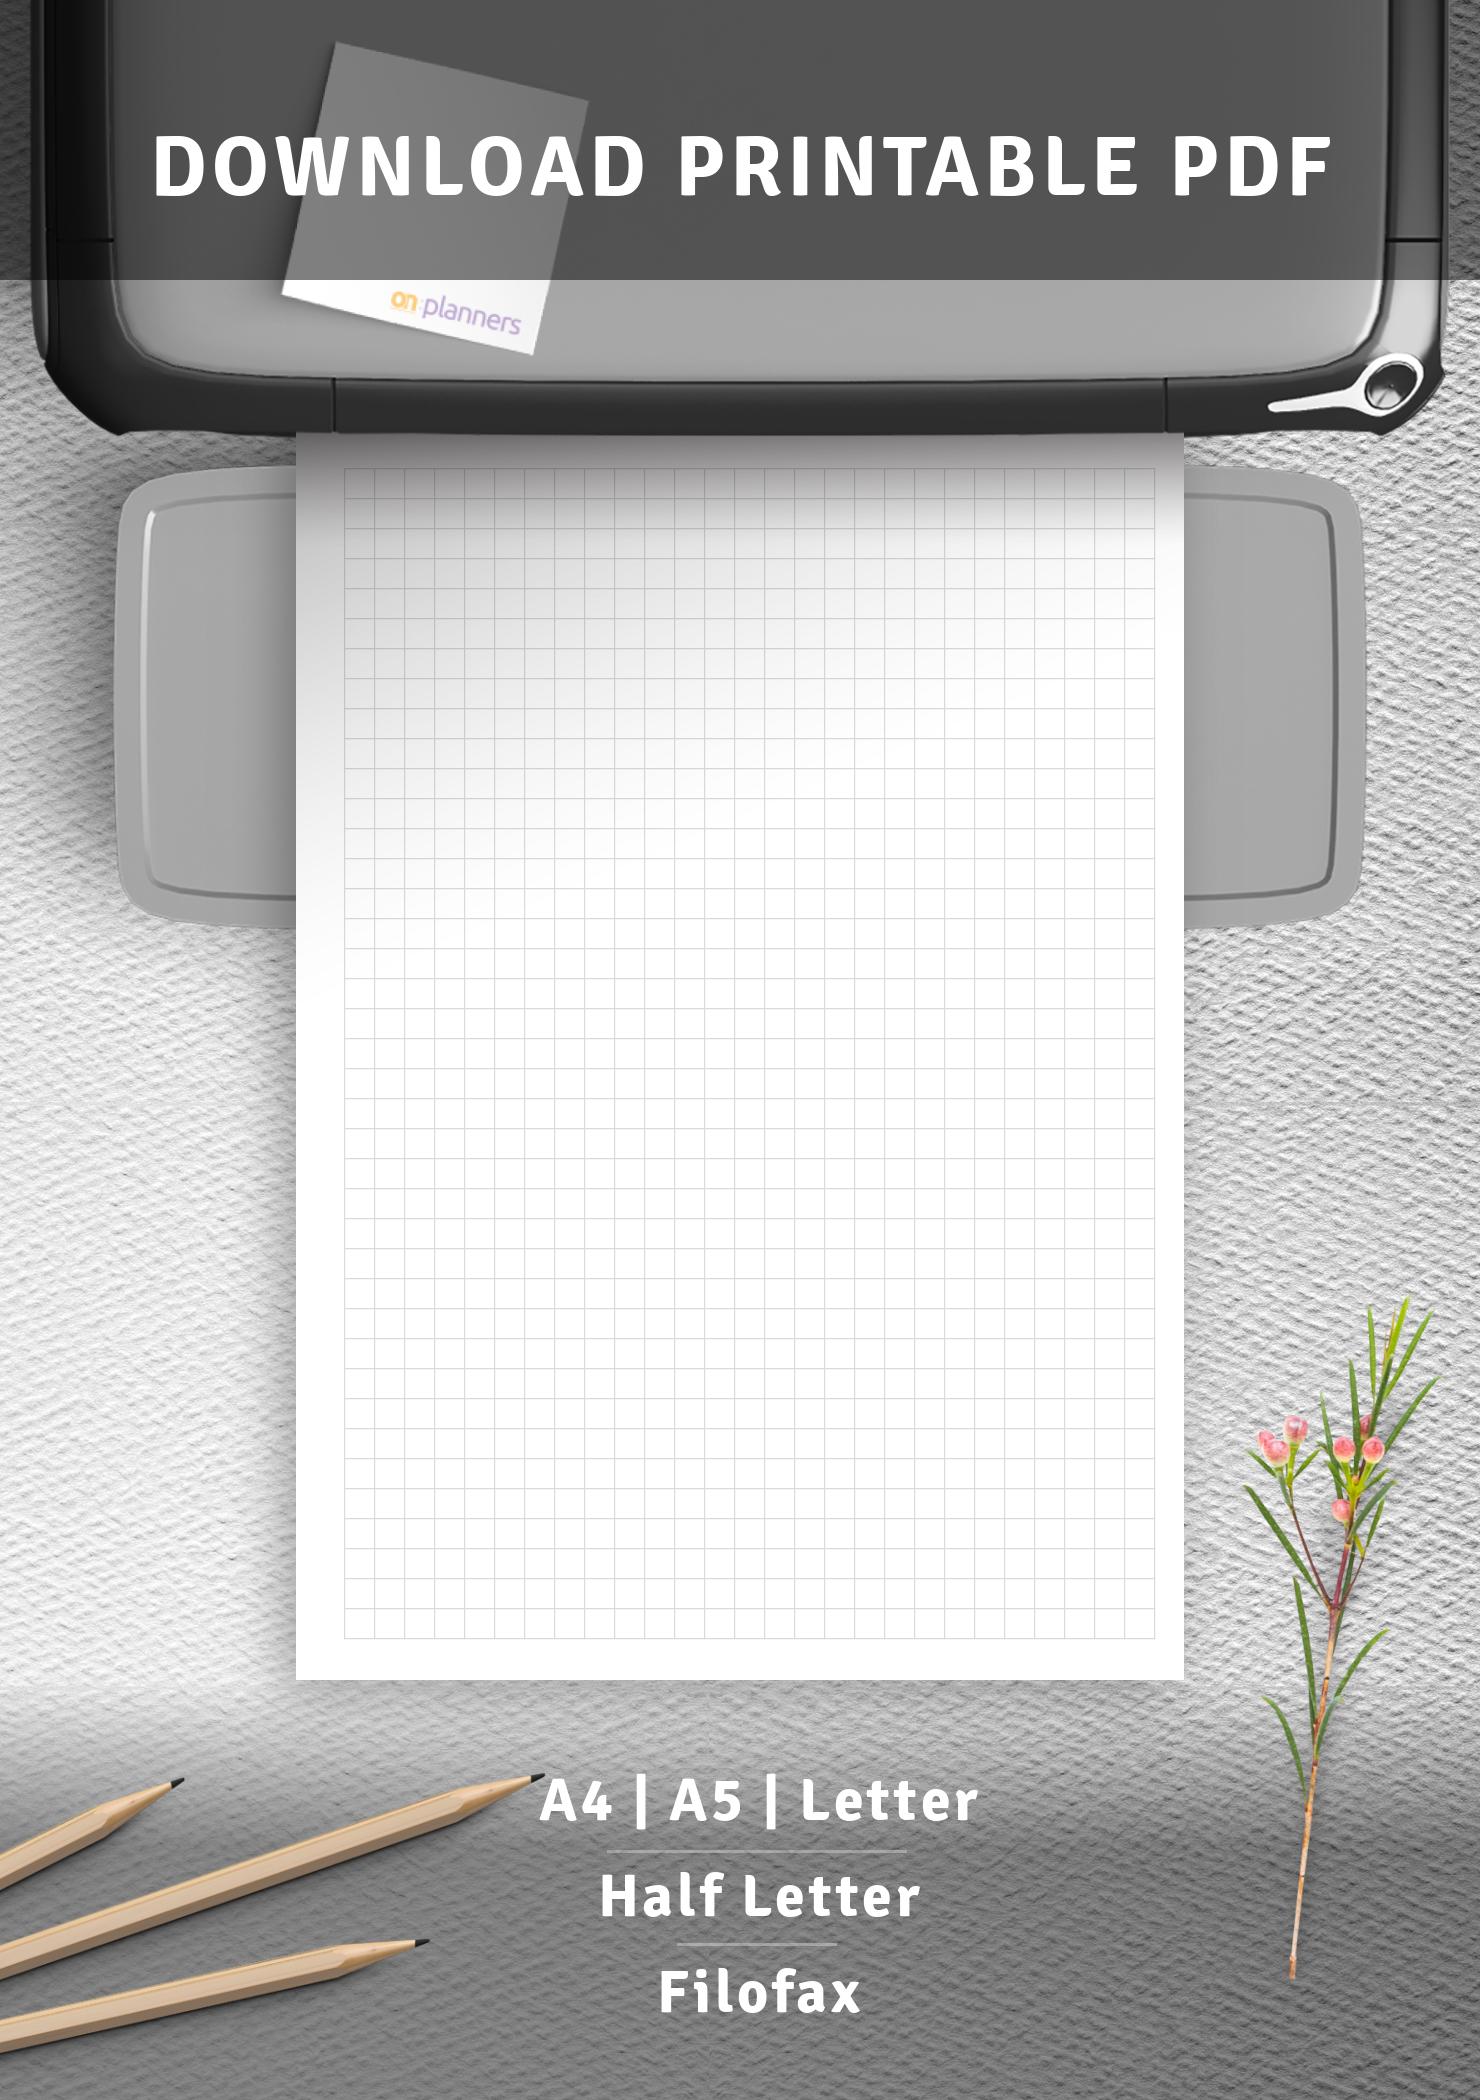 download printable 5mm graph paper printable pdf